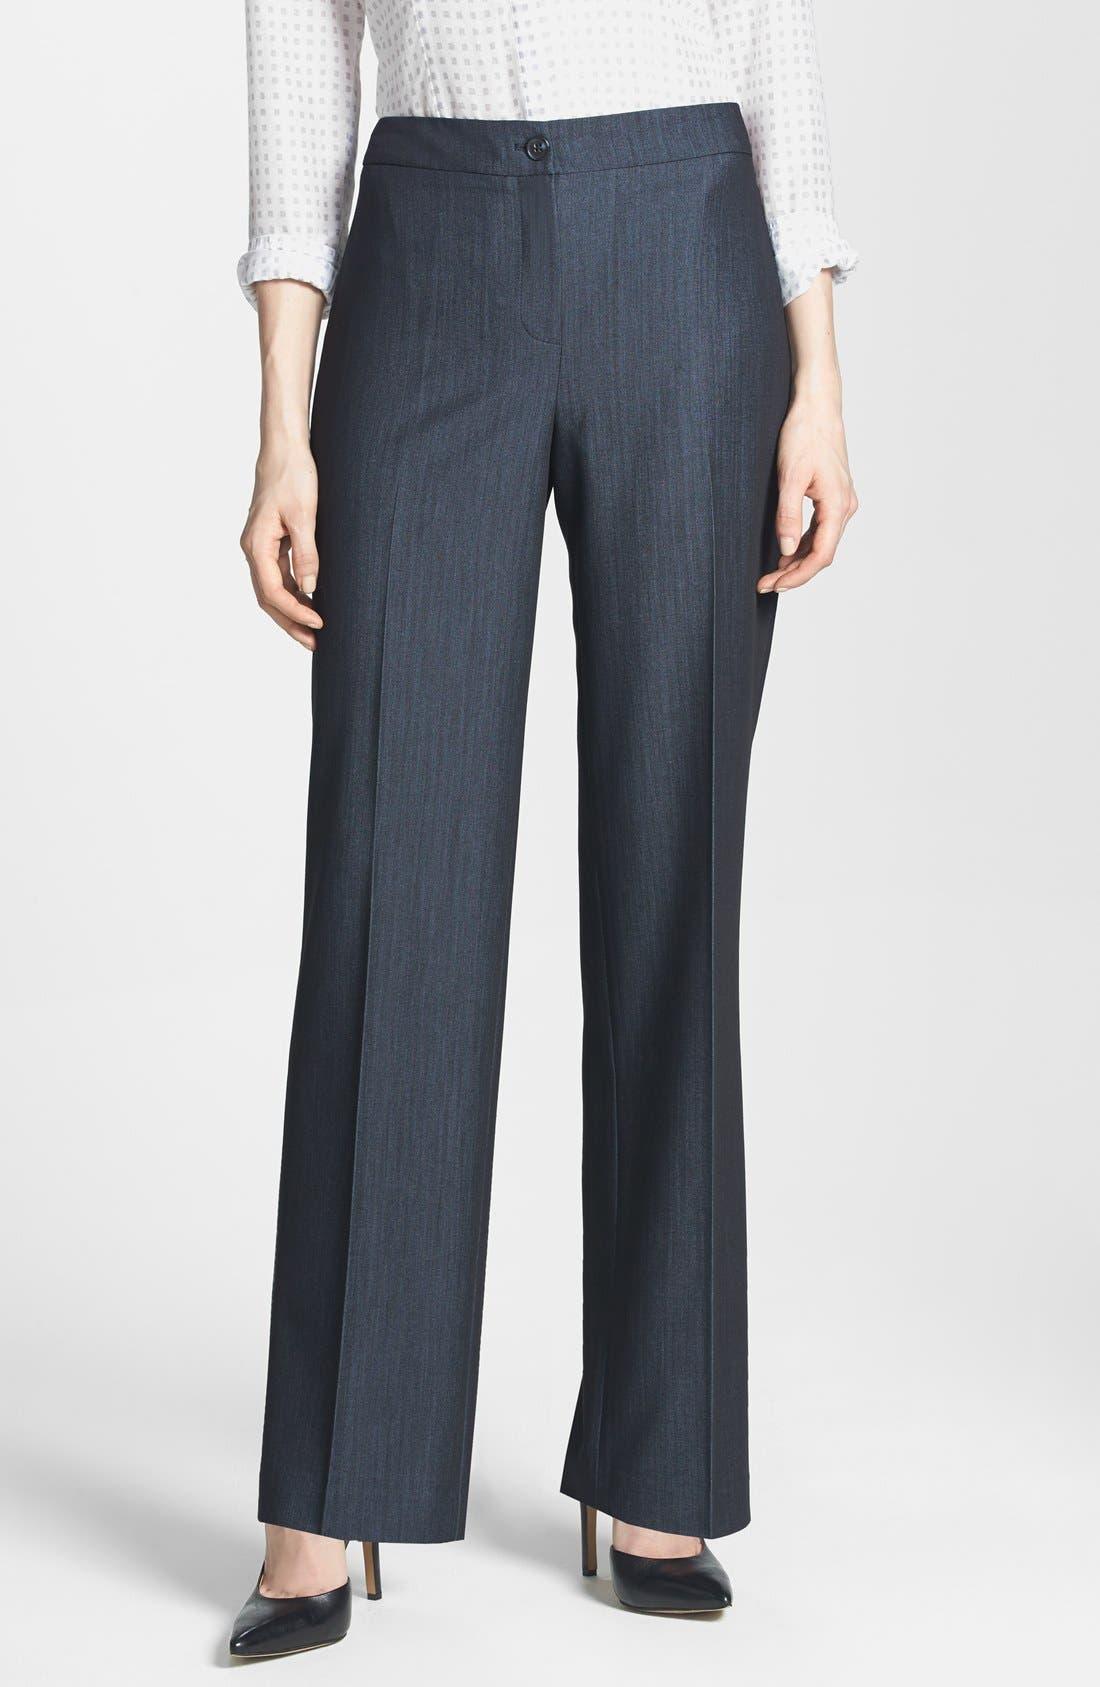 Main Image - Jones New York 'Sloane' Stretch Denim Mid Rise Pants (Regular & Petite)